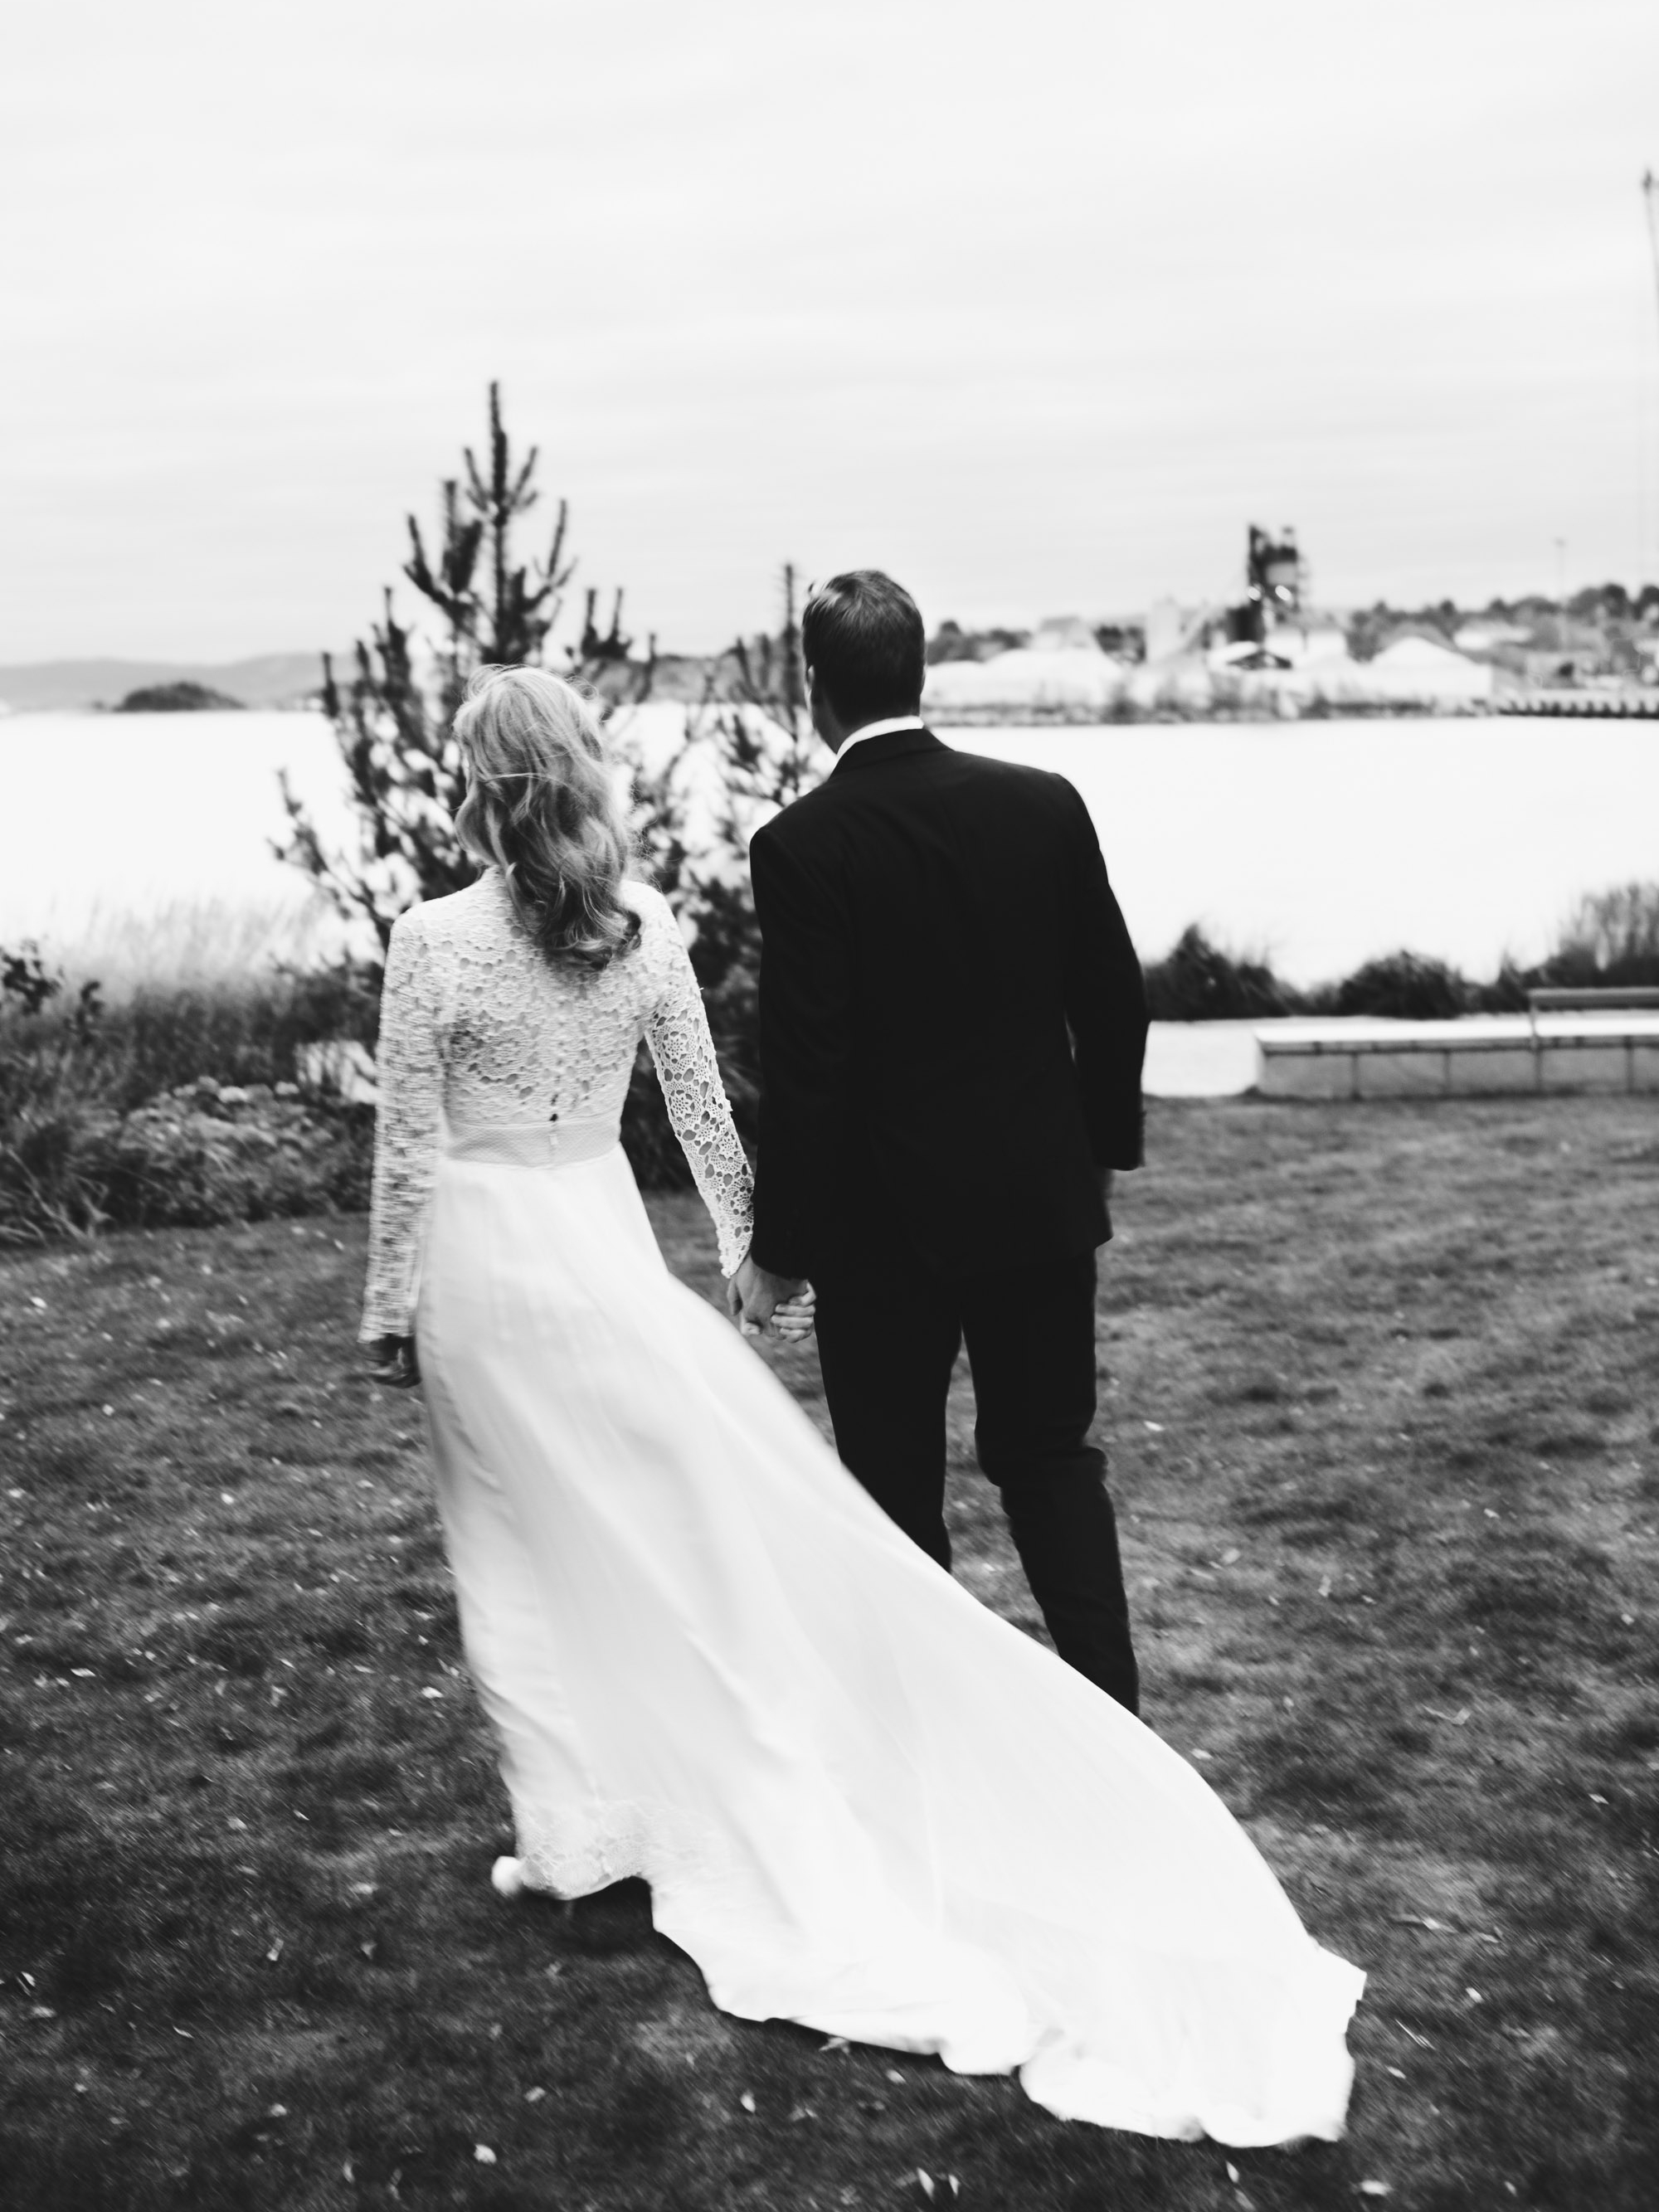 Erle & Henrik by Youna Baupoux